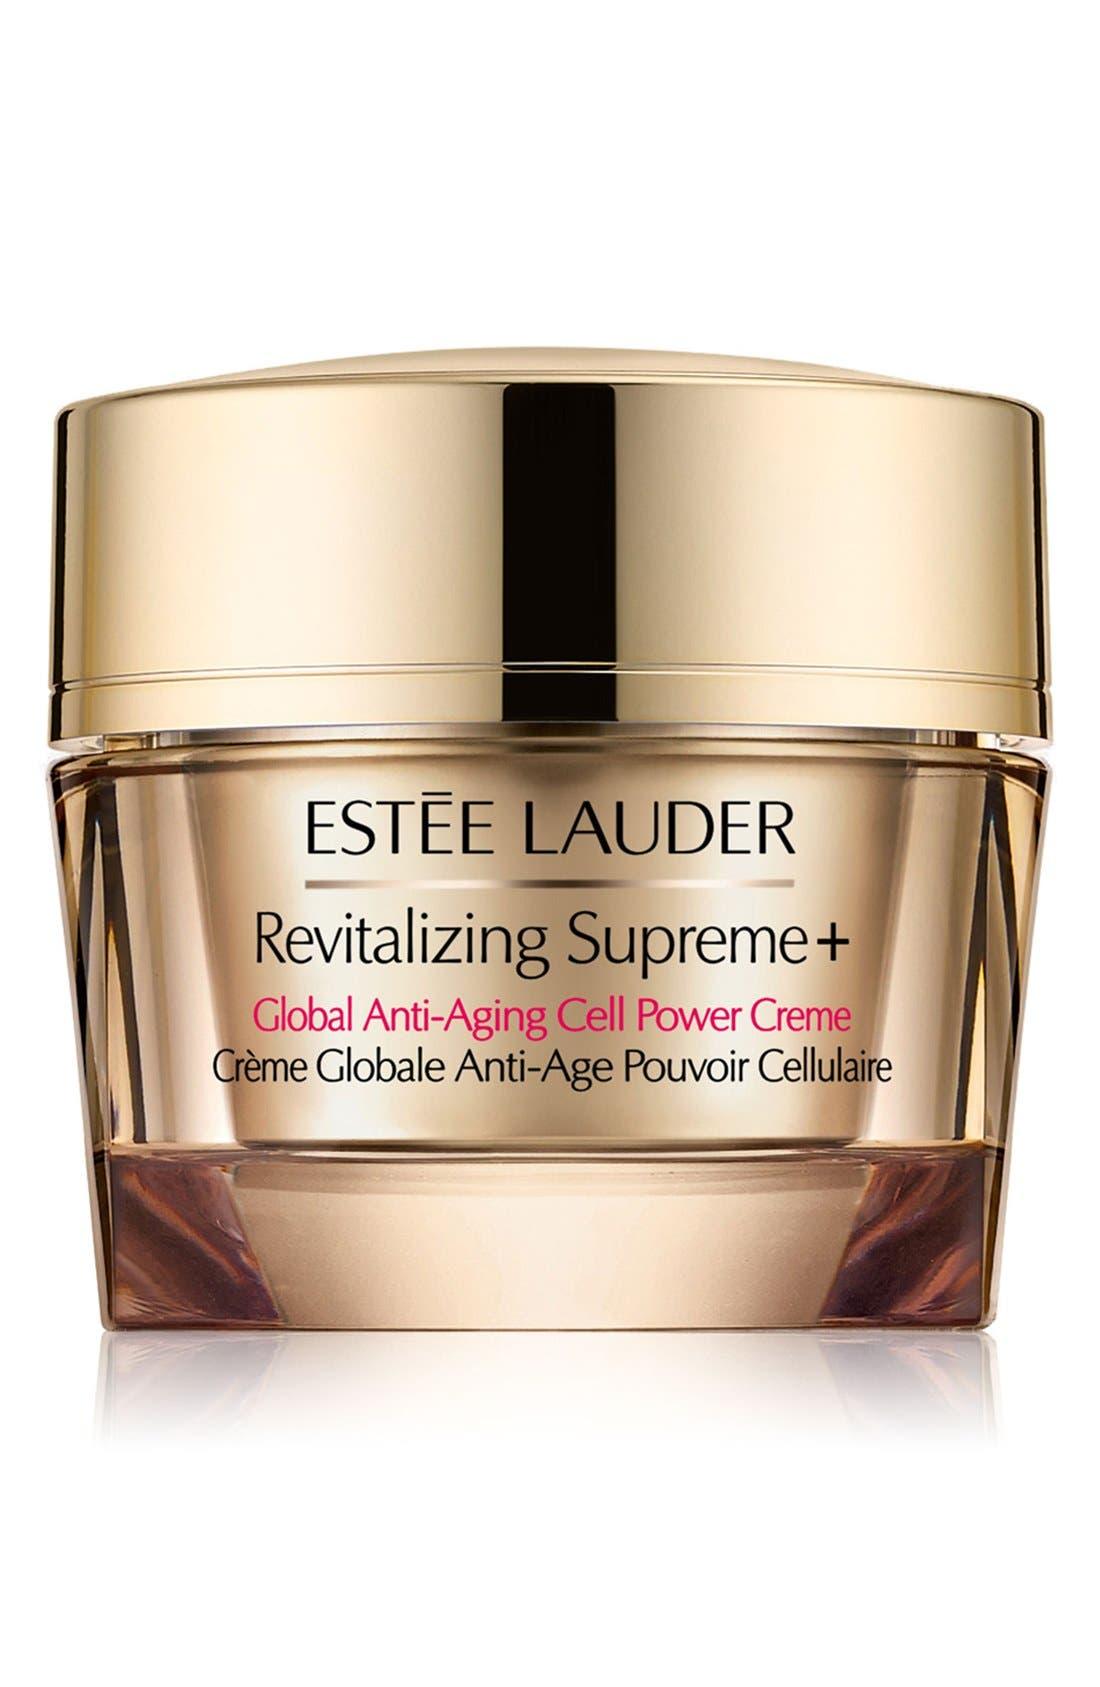 Estée Lauder 'Revitalizing Supreme+' Global Anti-Aging Cell Power Creme